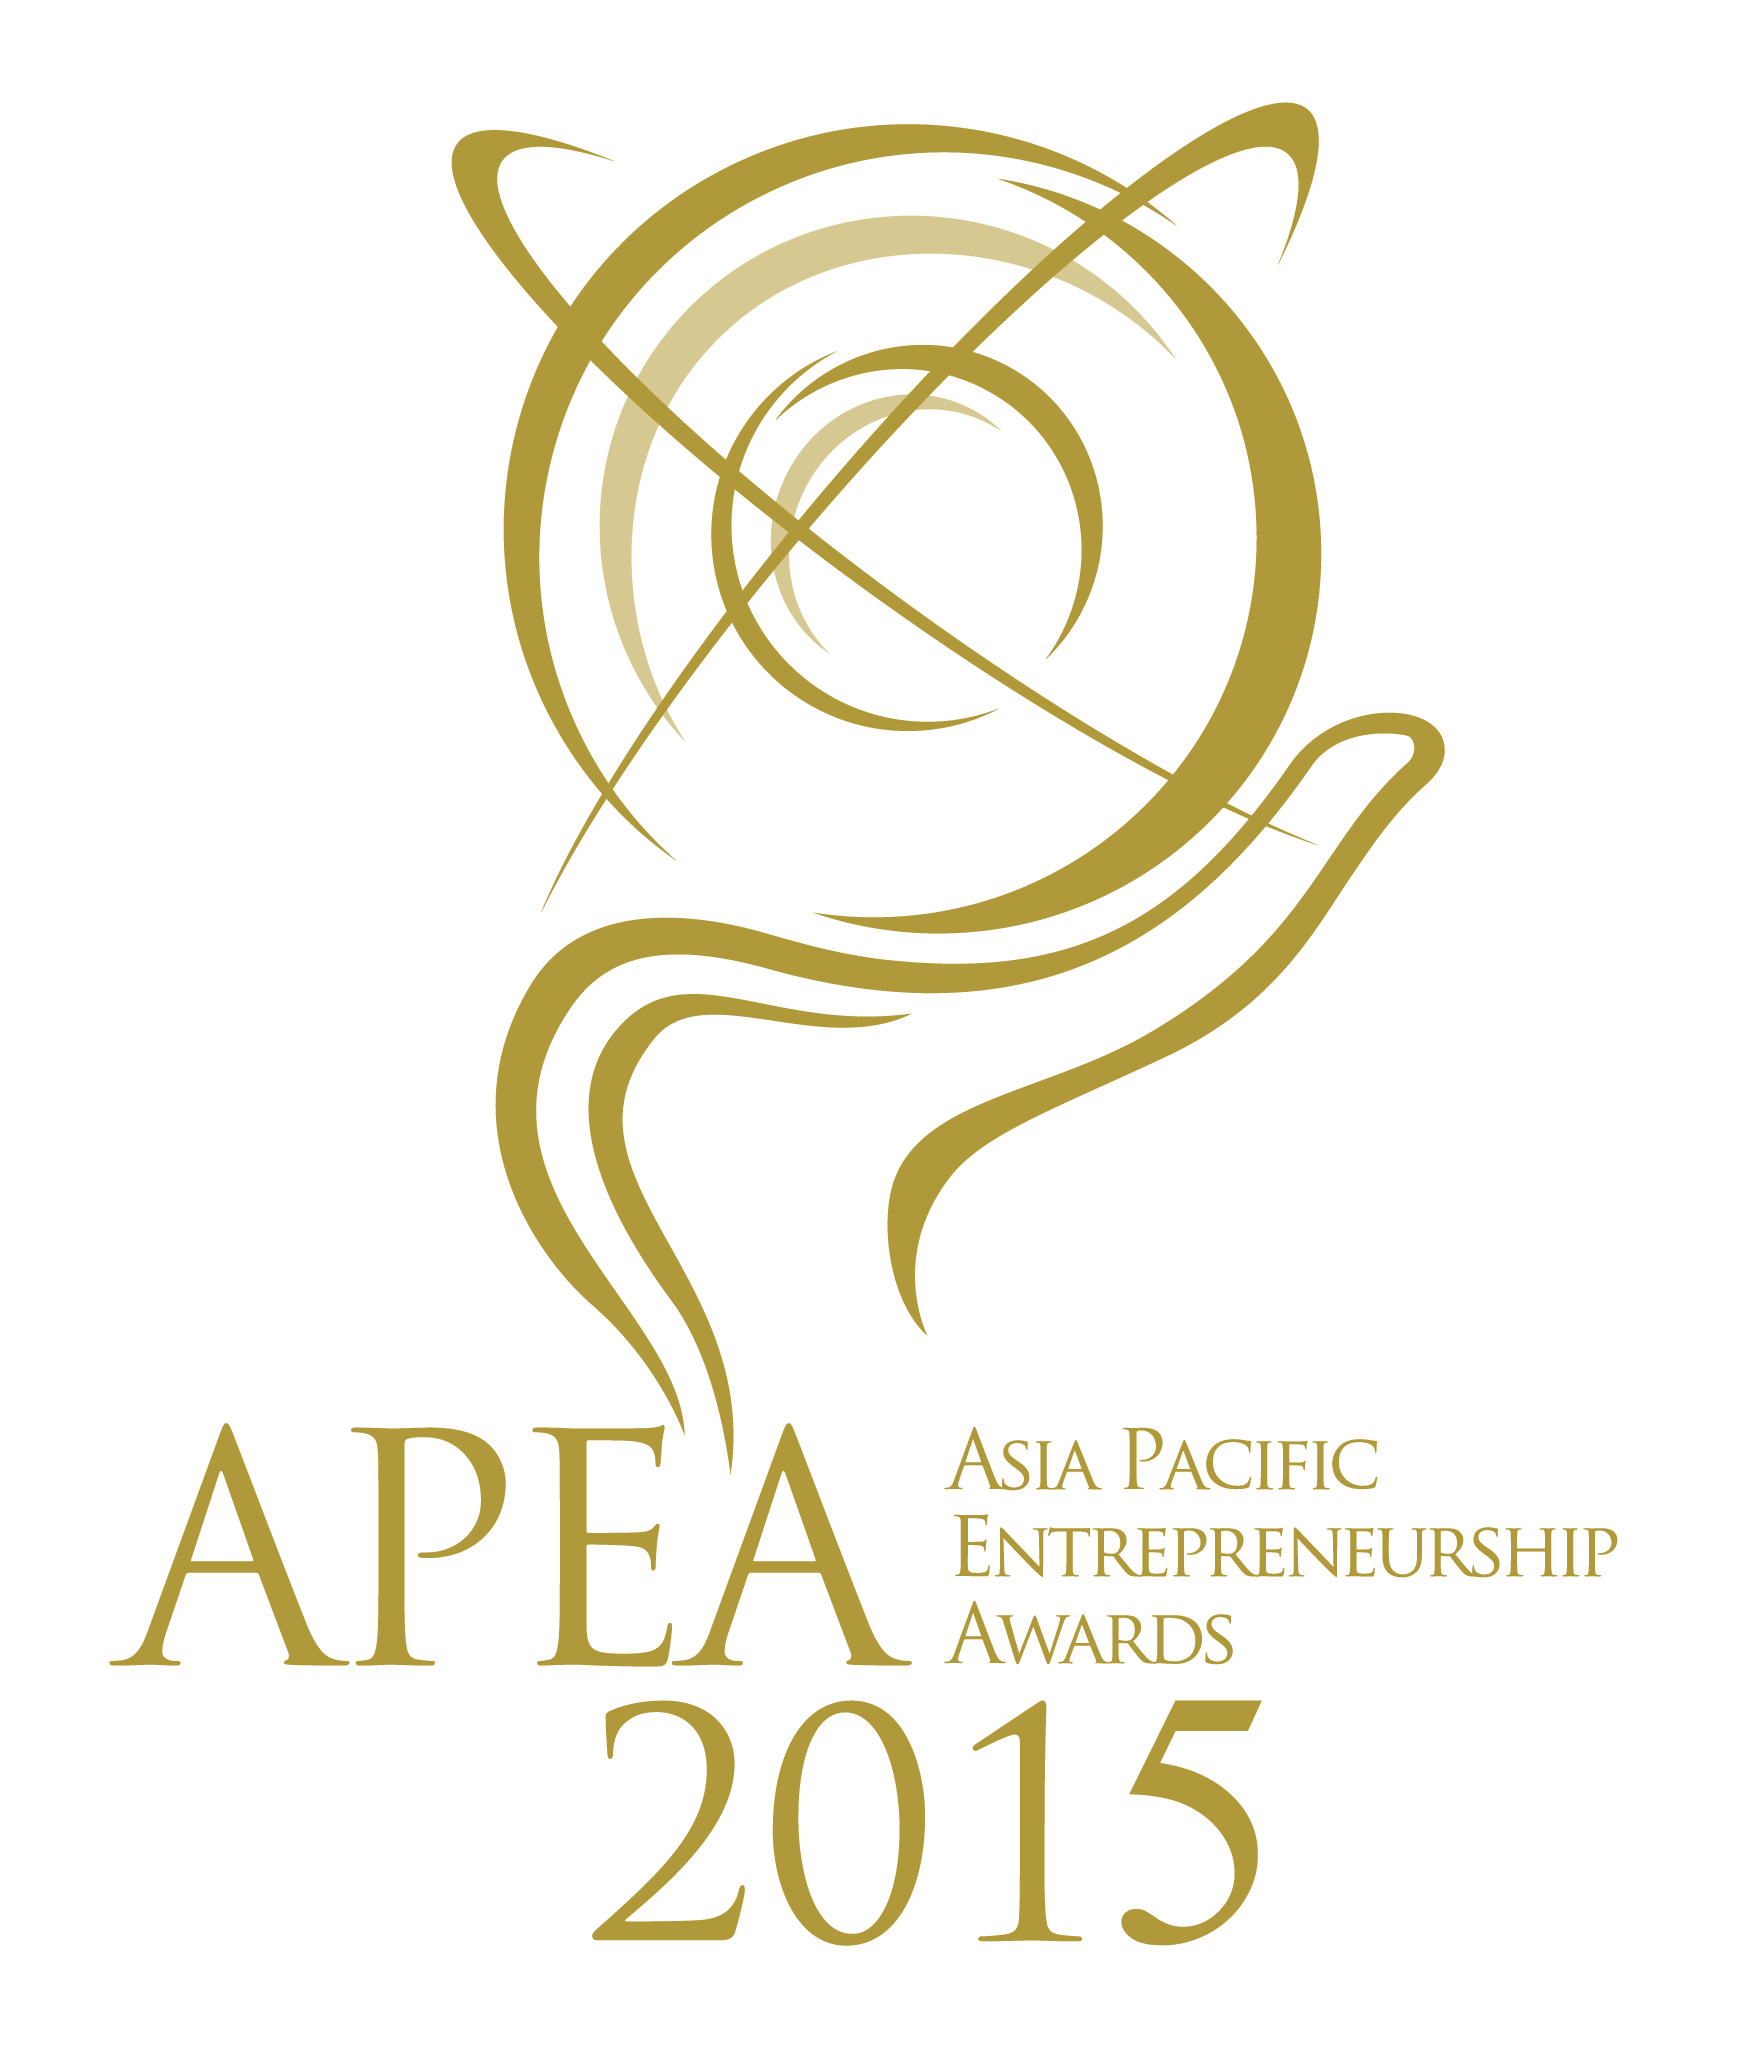 APEA 2015 Logo.jpg